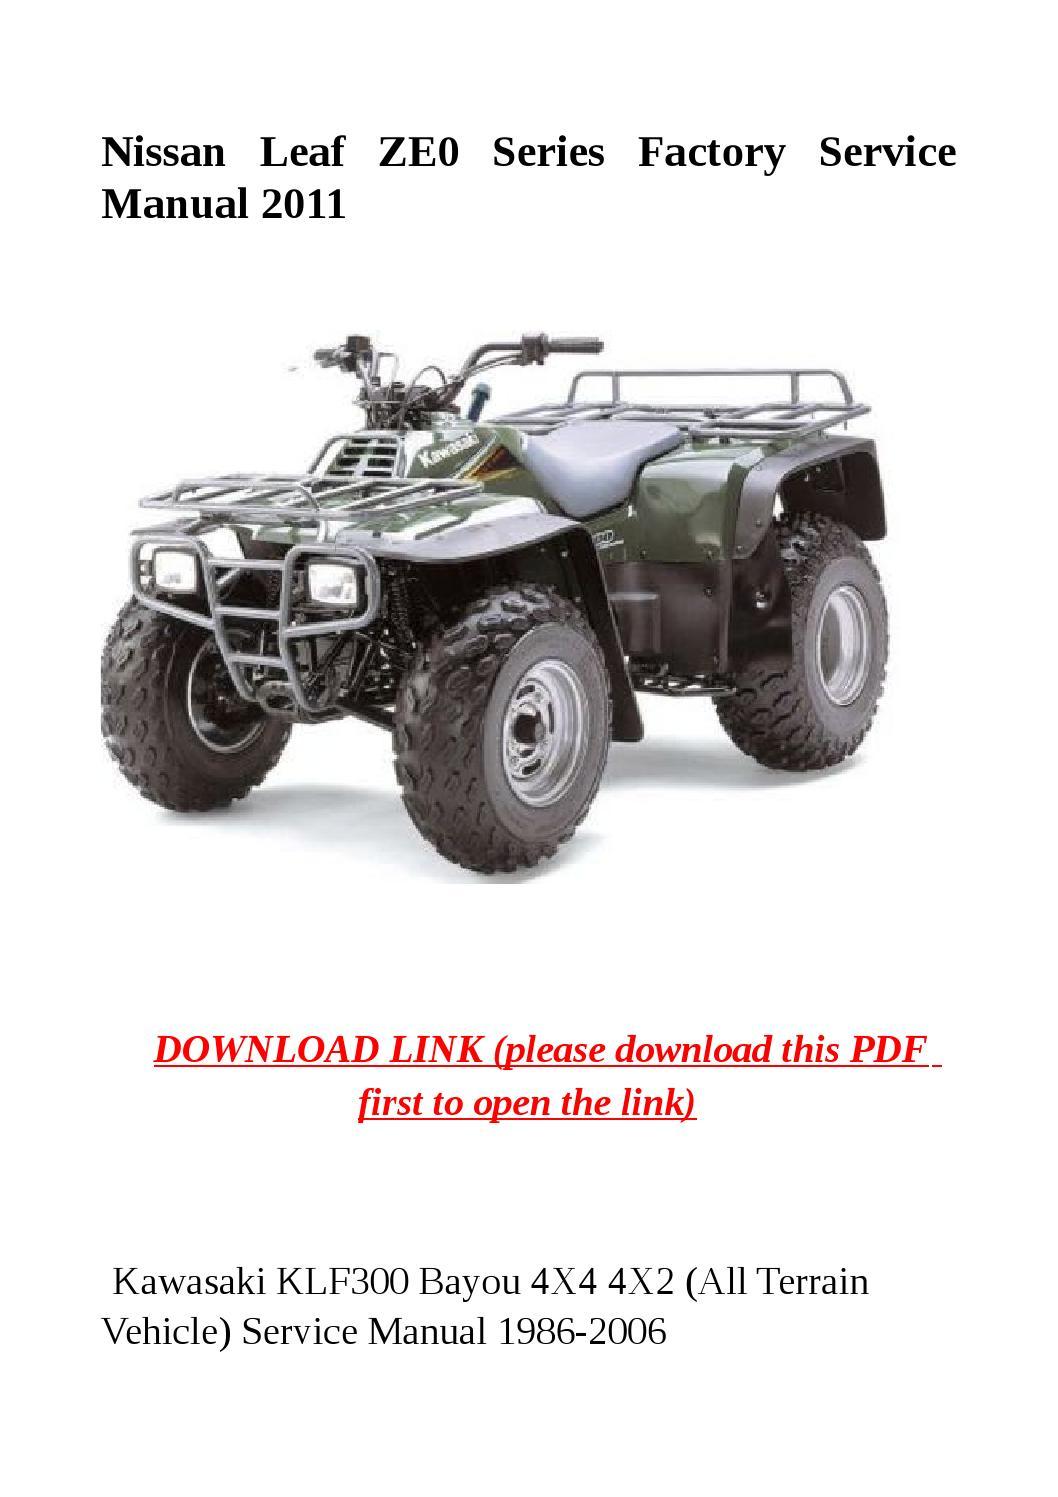 kawasaki 300 vtt service manual